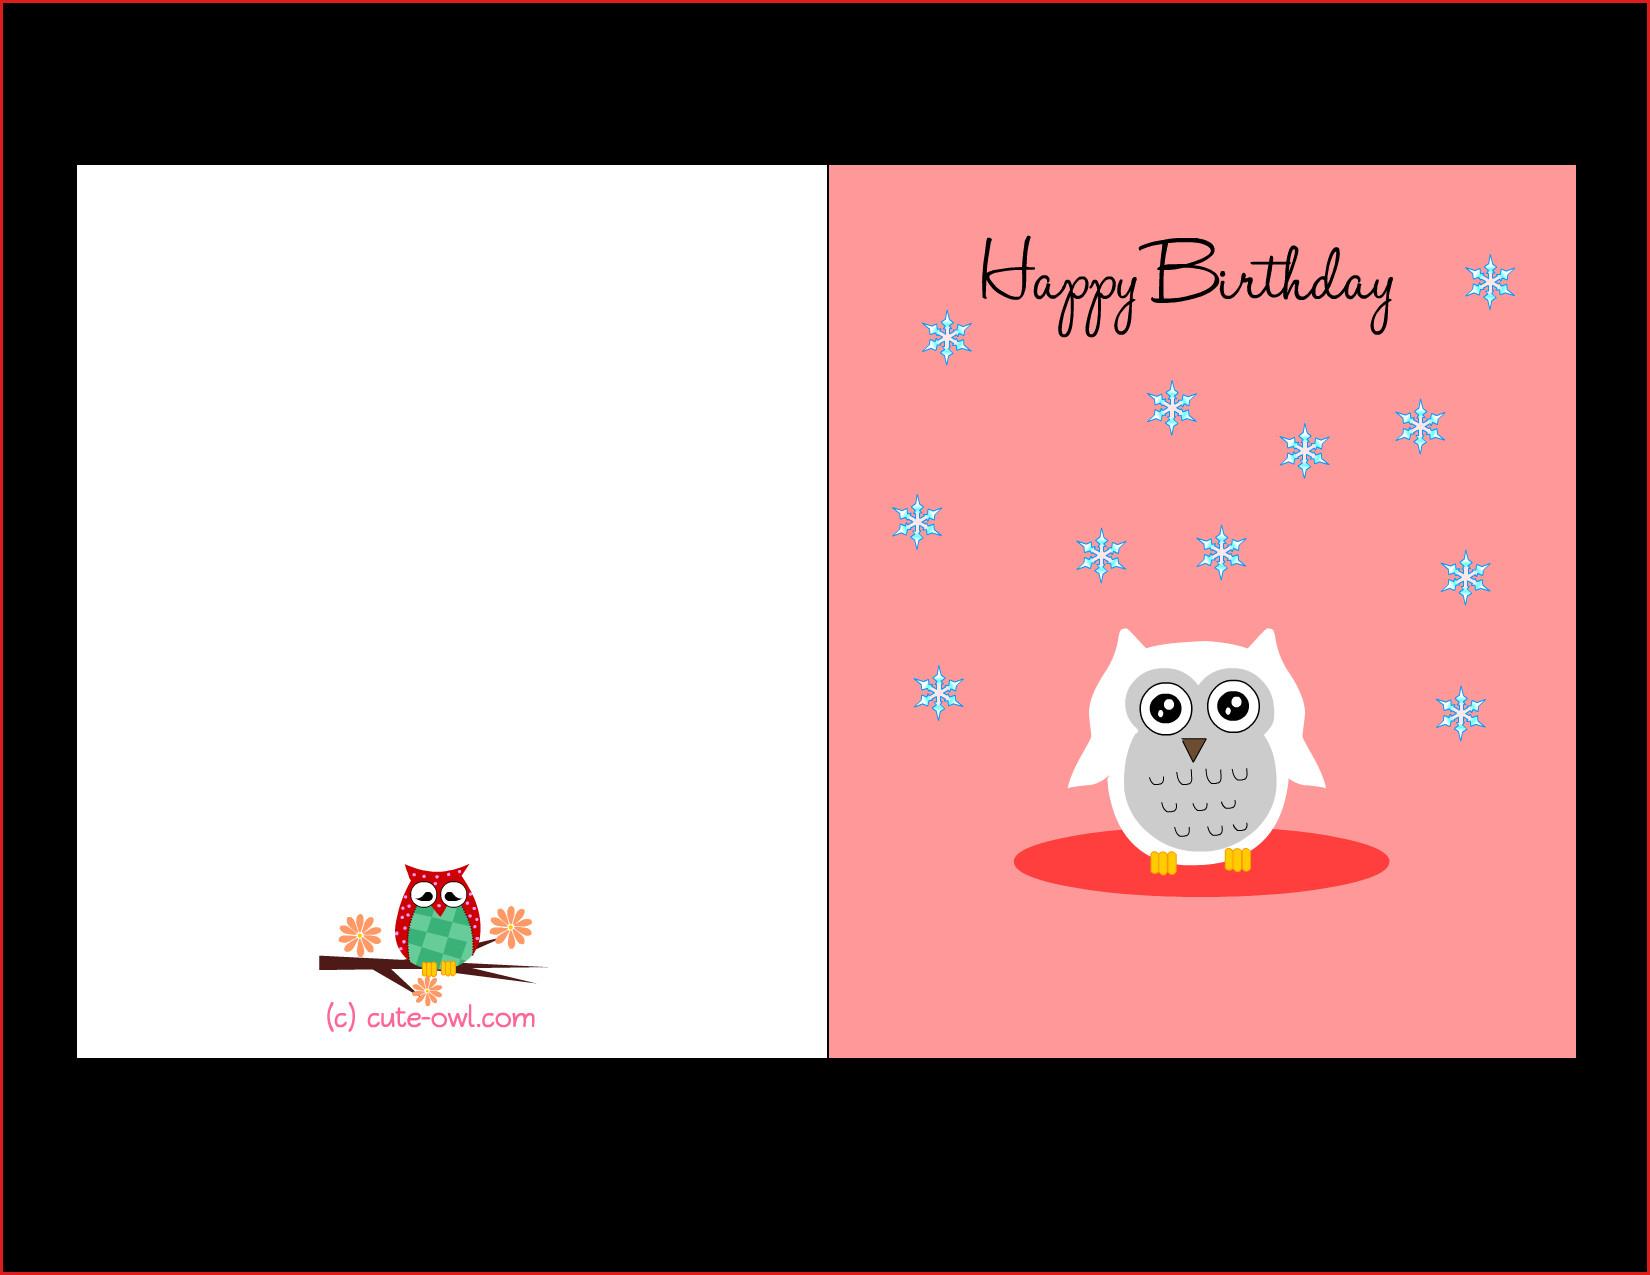 17 Professional Print Free Birthday Cards Online : Lenq - Free Printable Happy Birthday Cards Online